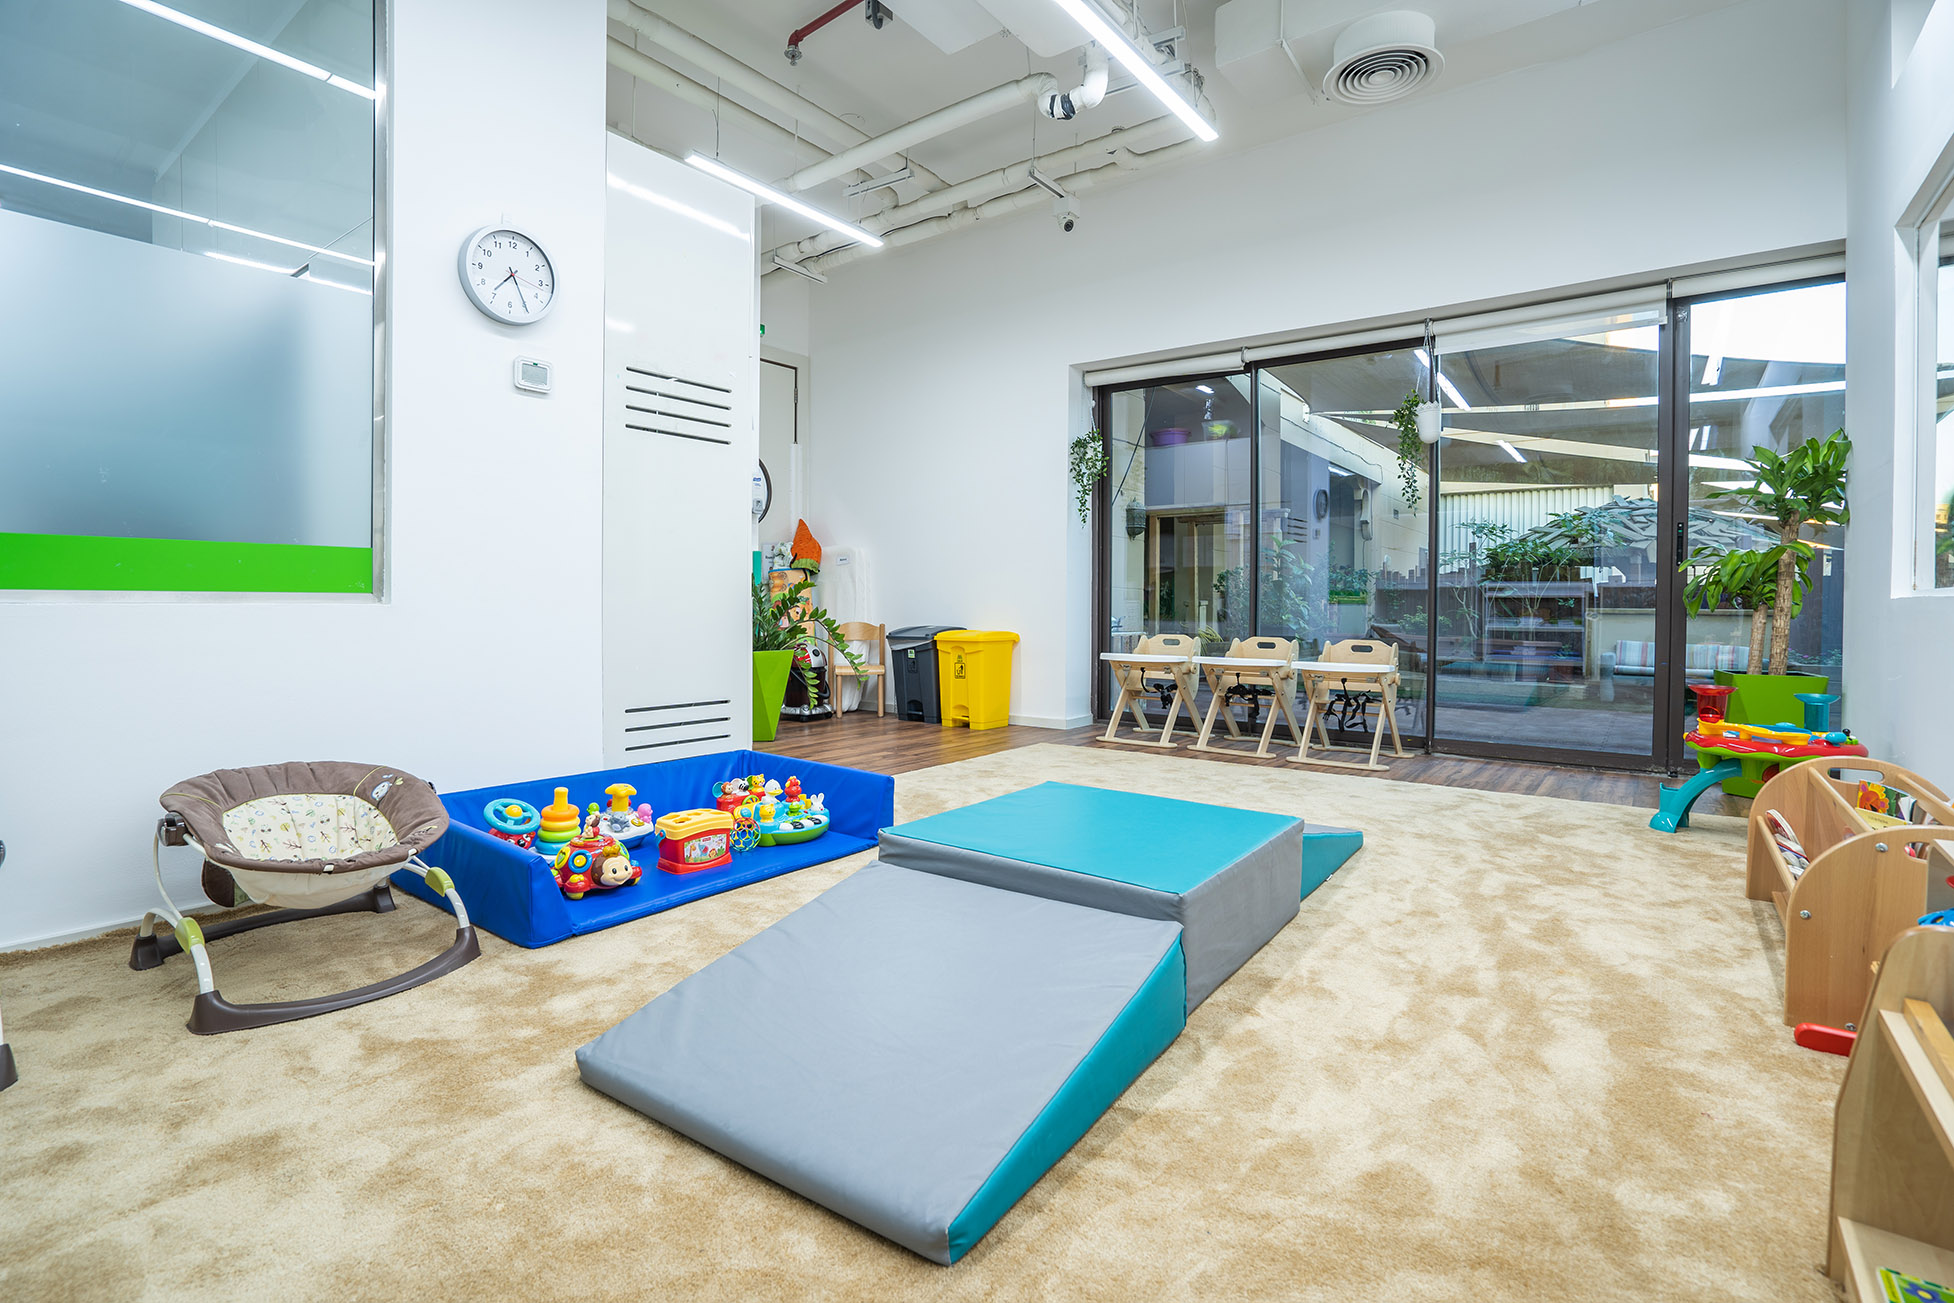 RWN Palm classroom 3